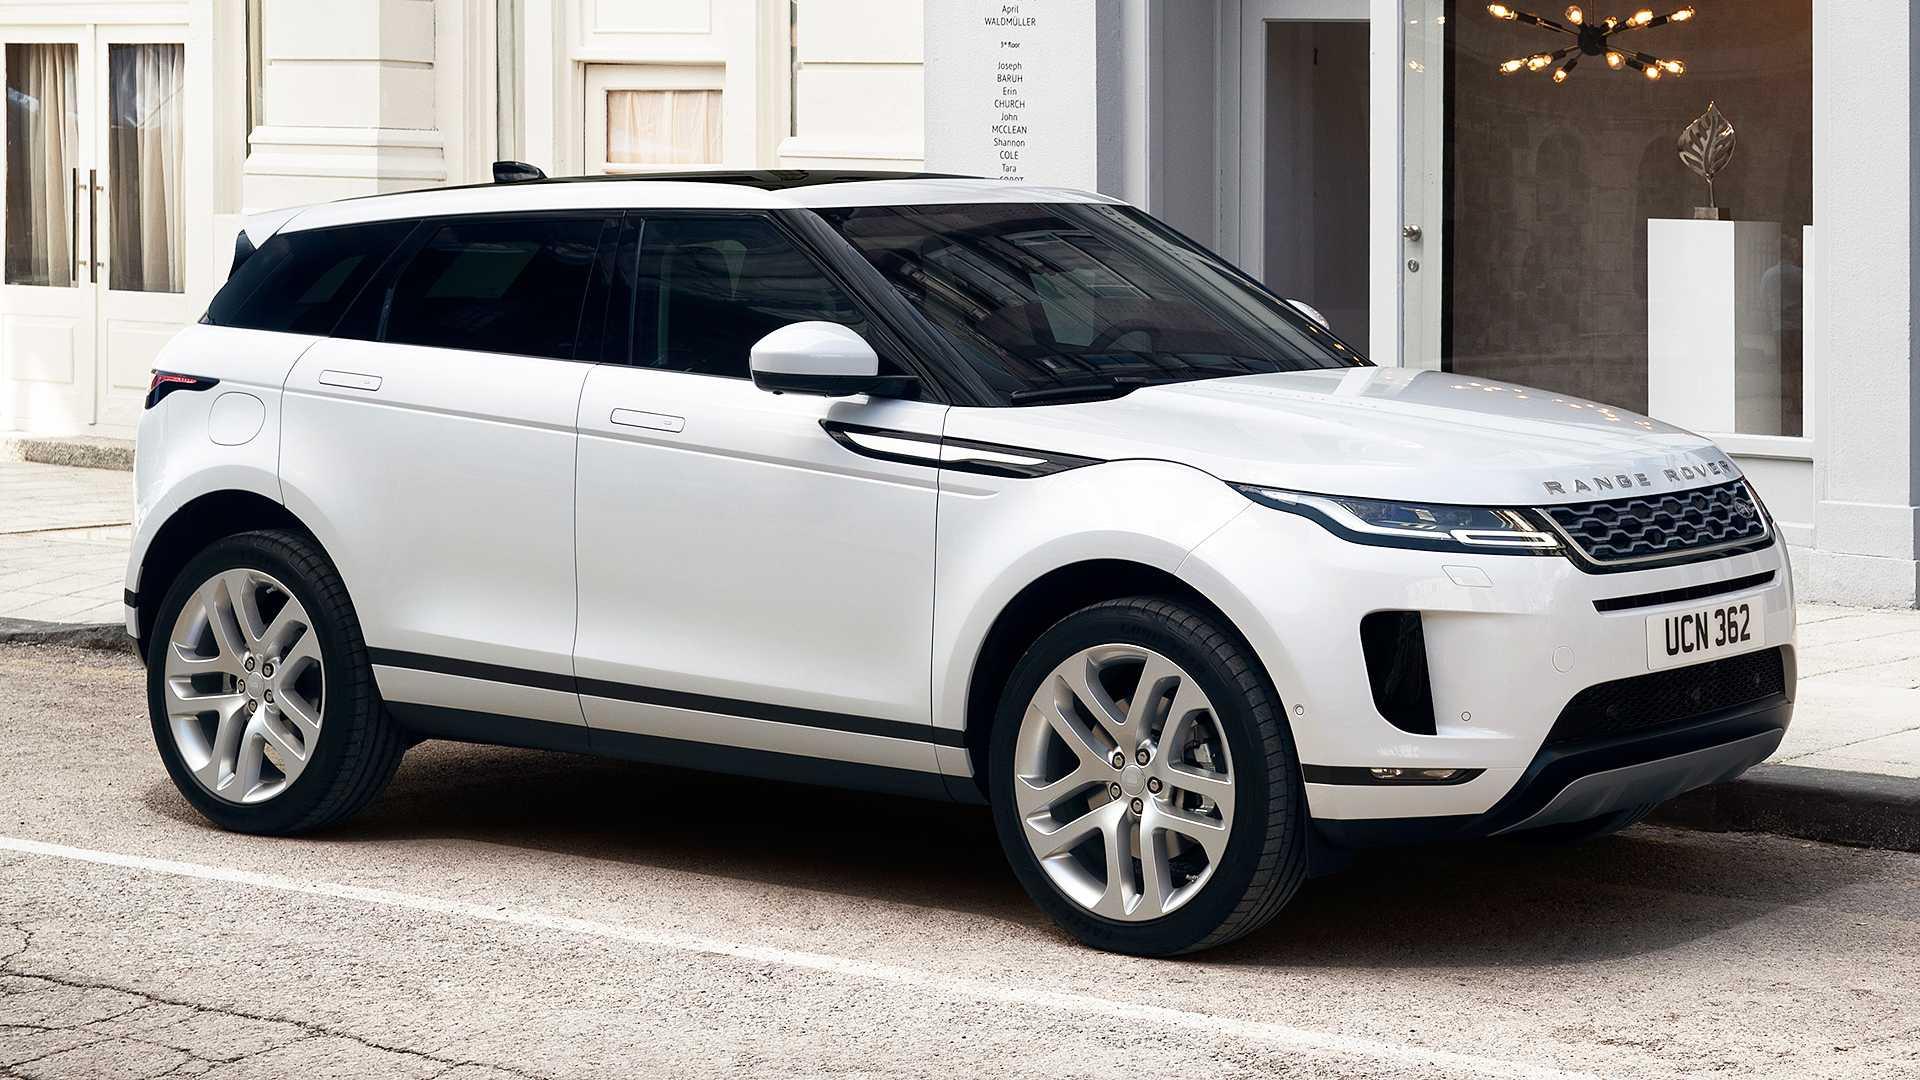 2020-range-rover-evoque (66)